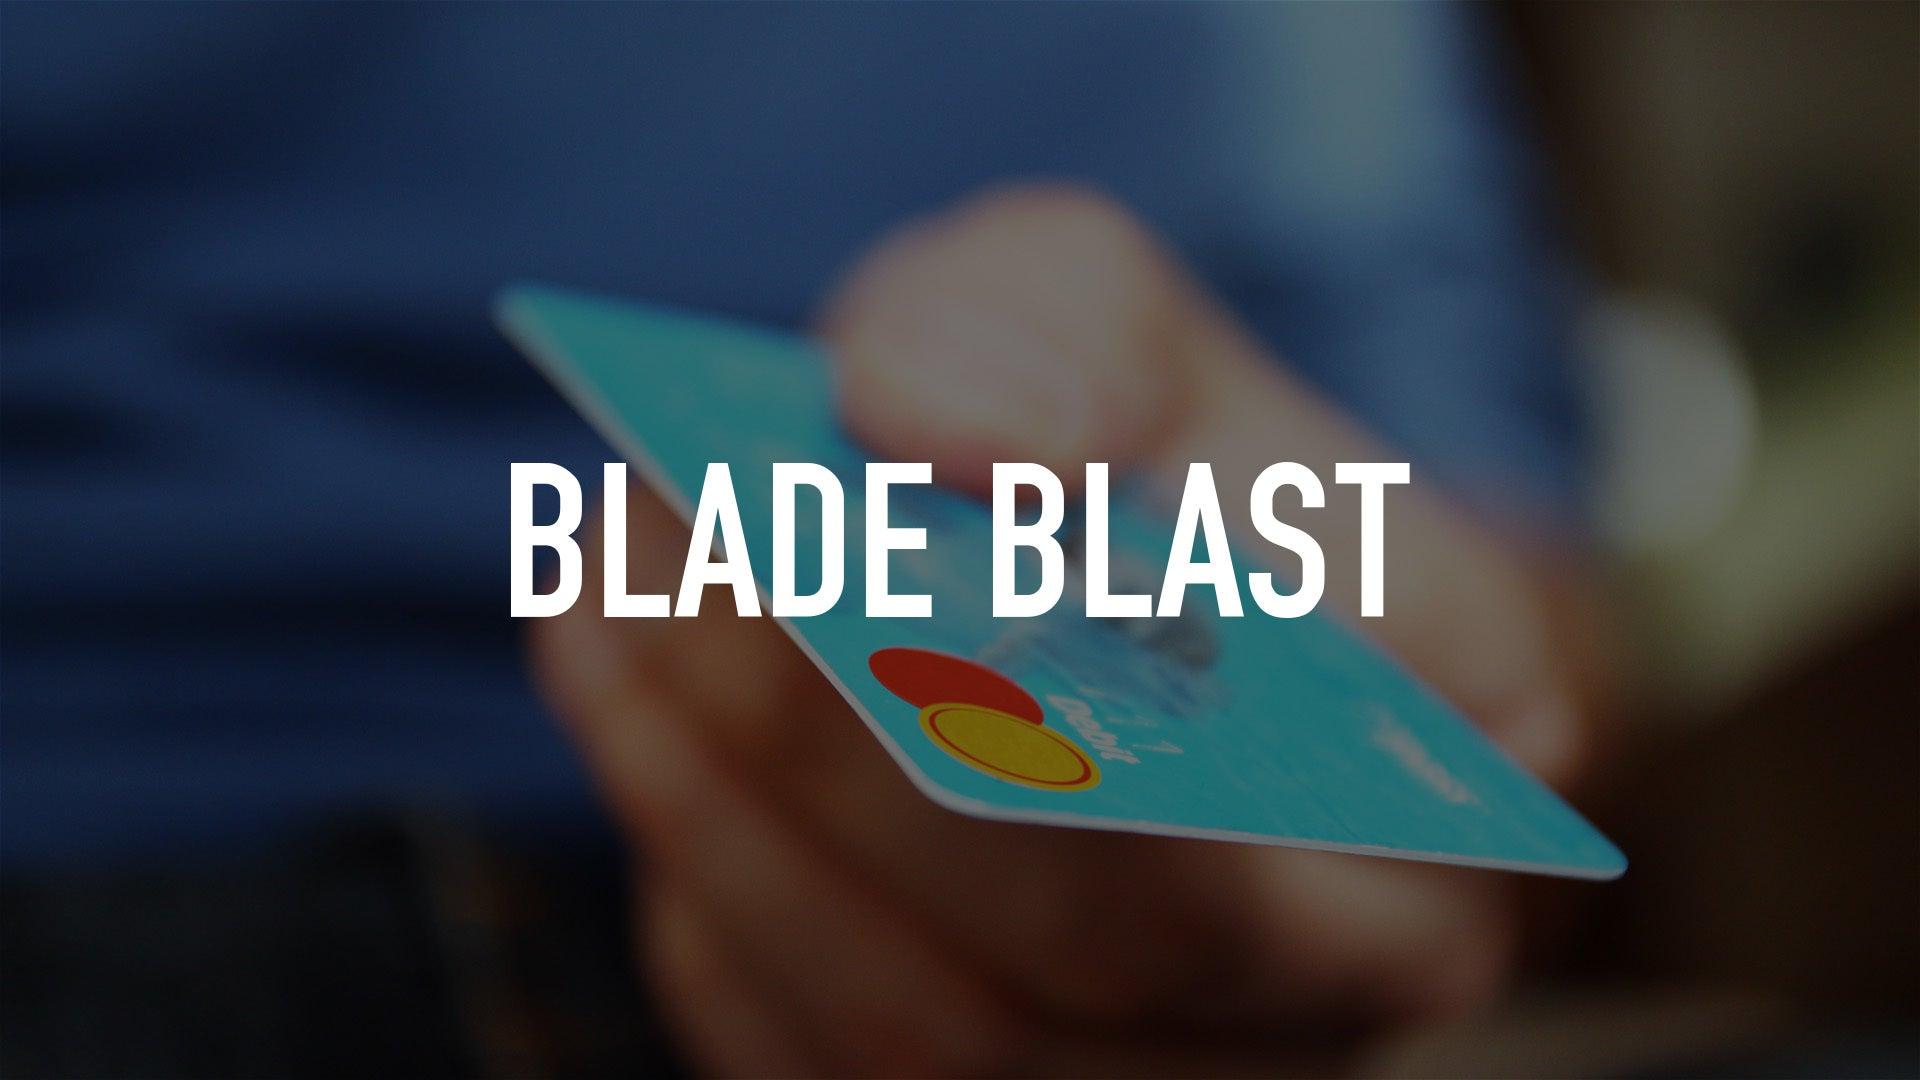 Blade Blast